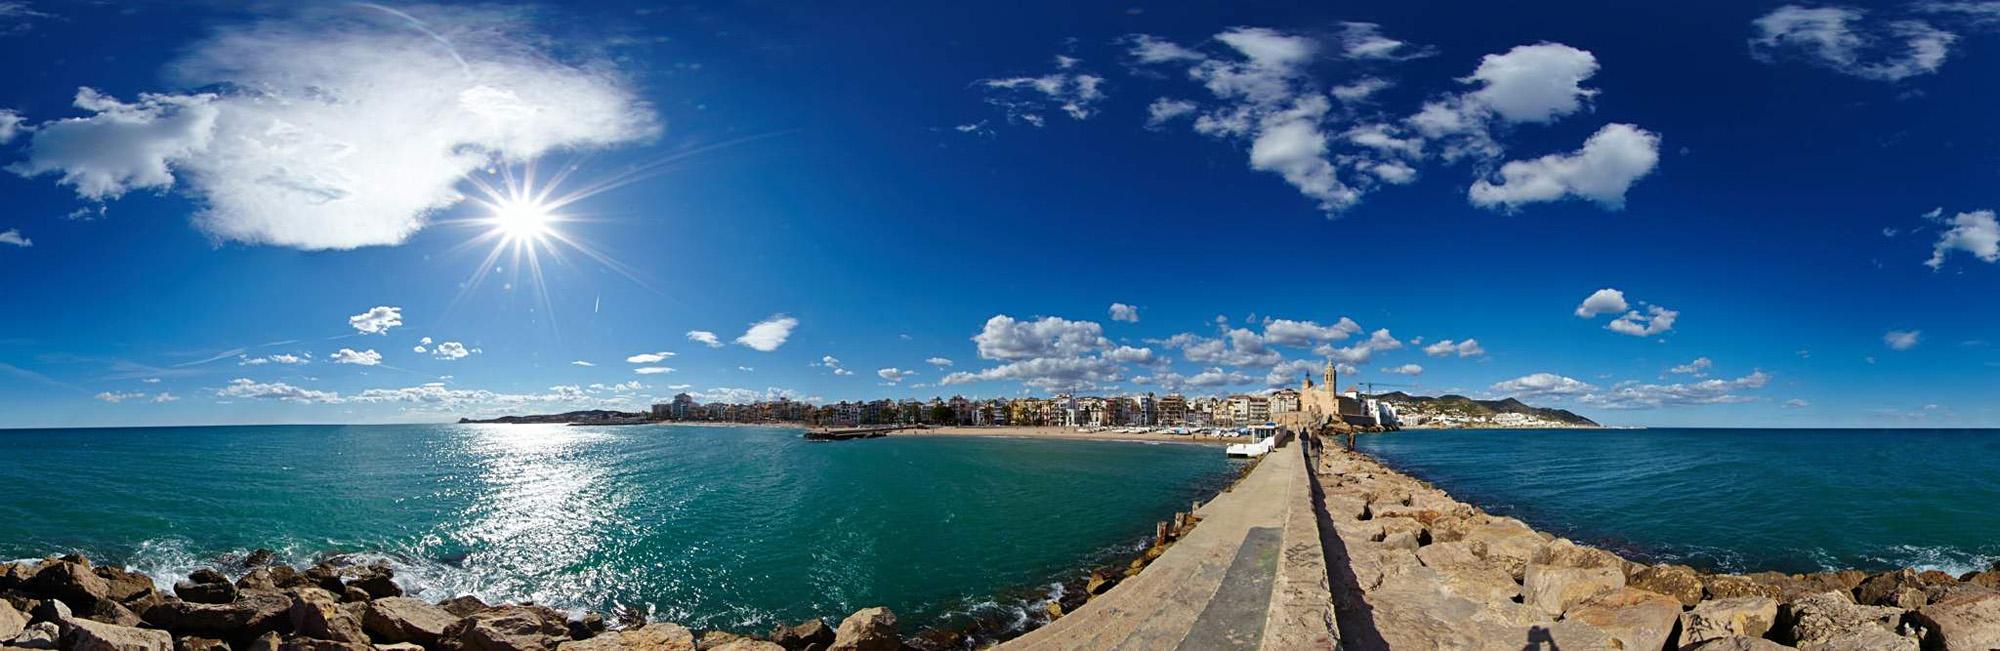 Sitges, Creative, Panorama, 360